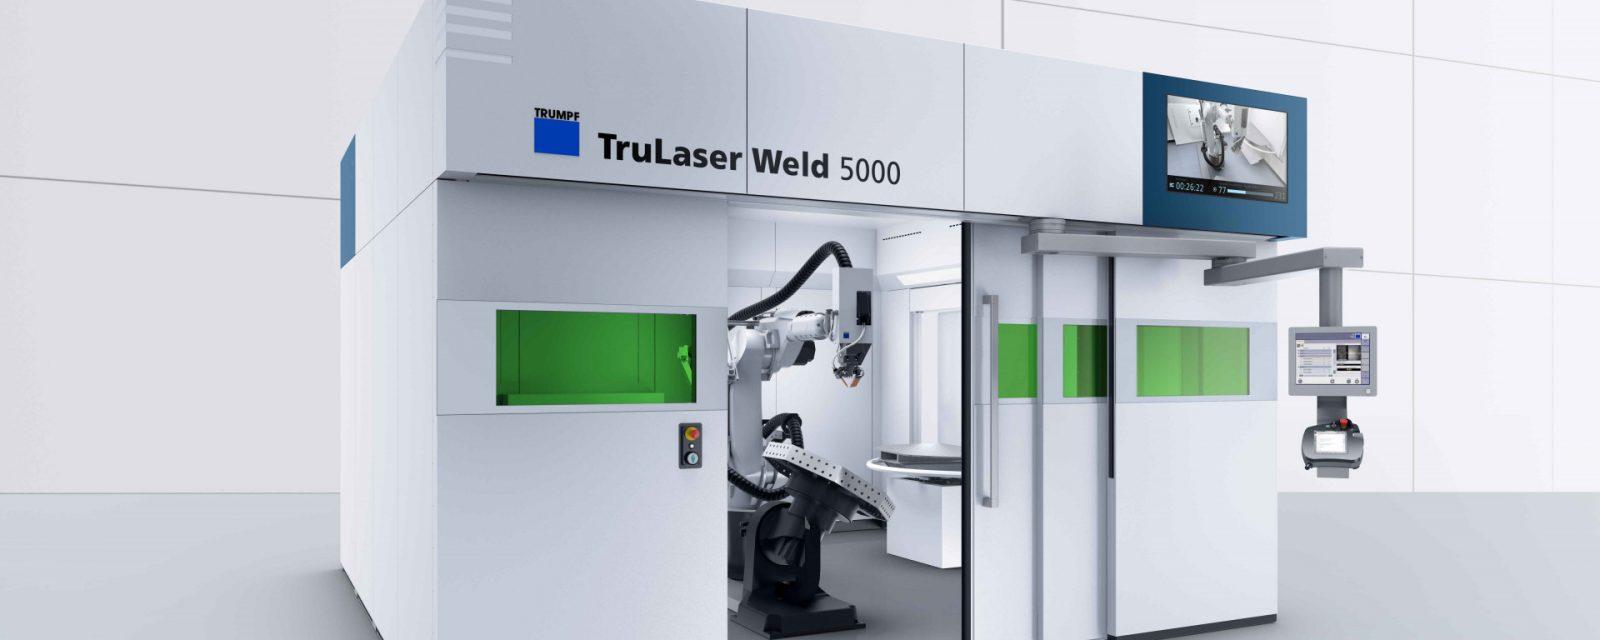 trulaser-weld-5000-karbitud-laserkeevitus